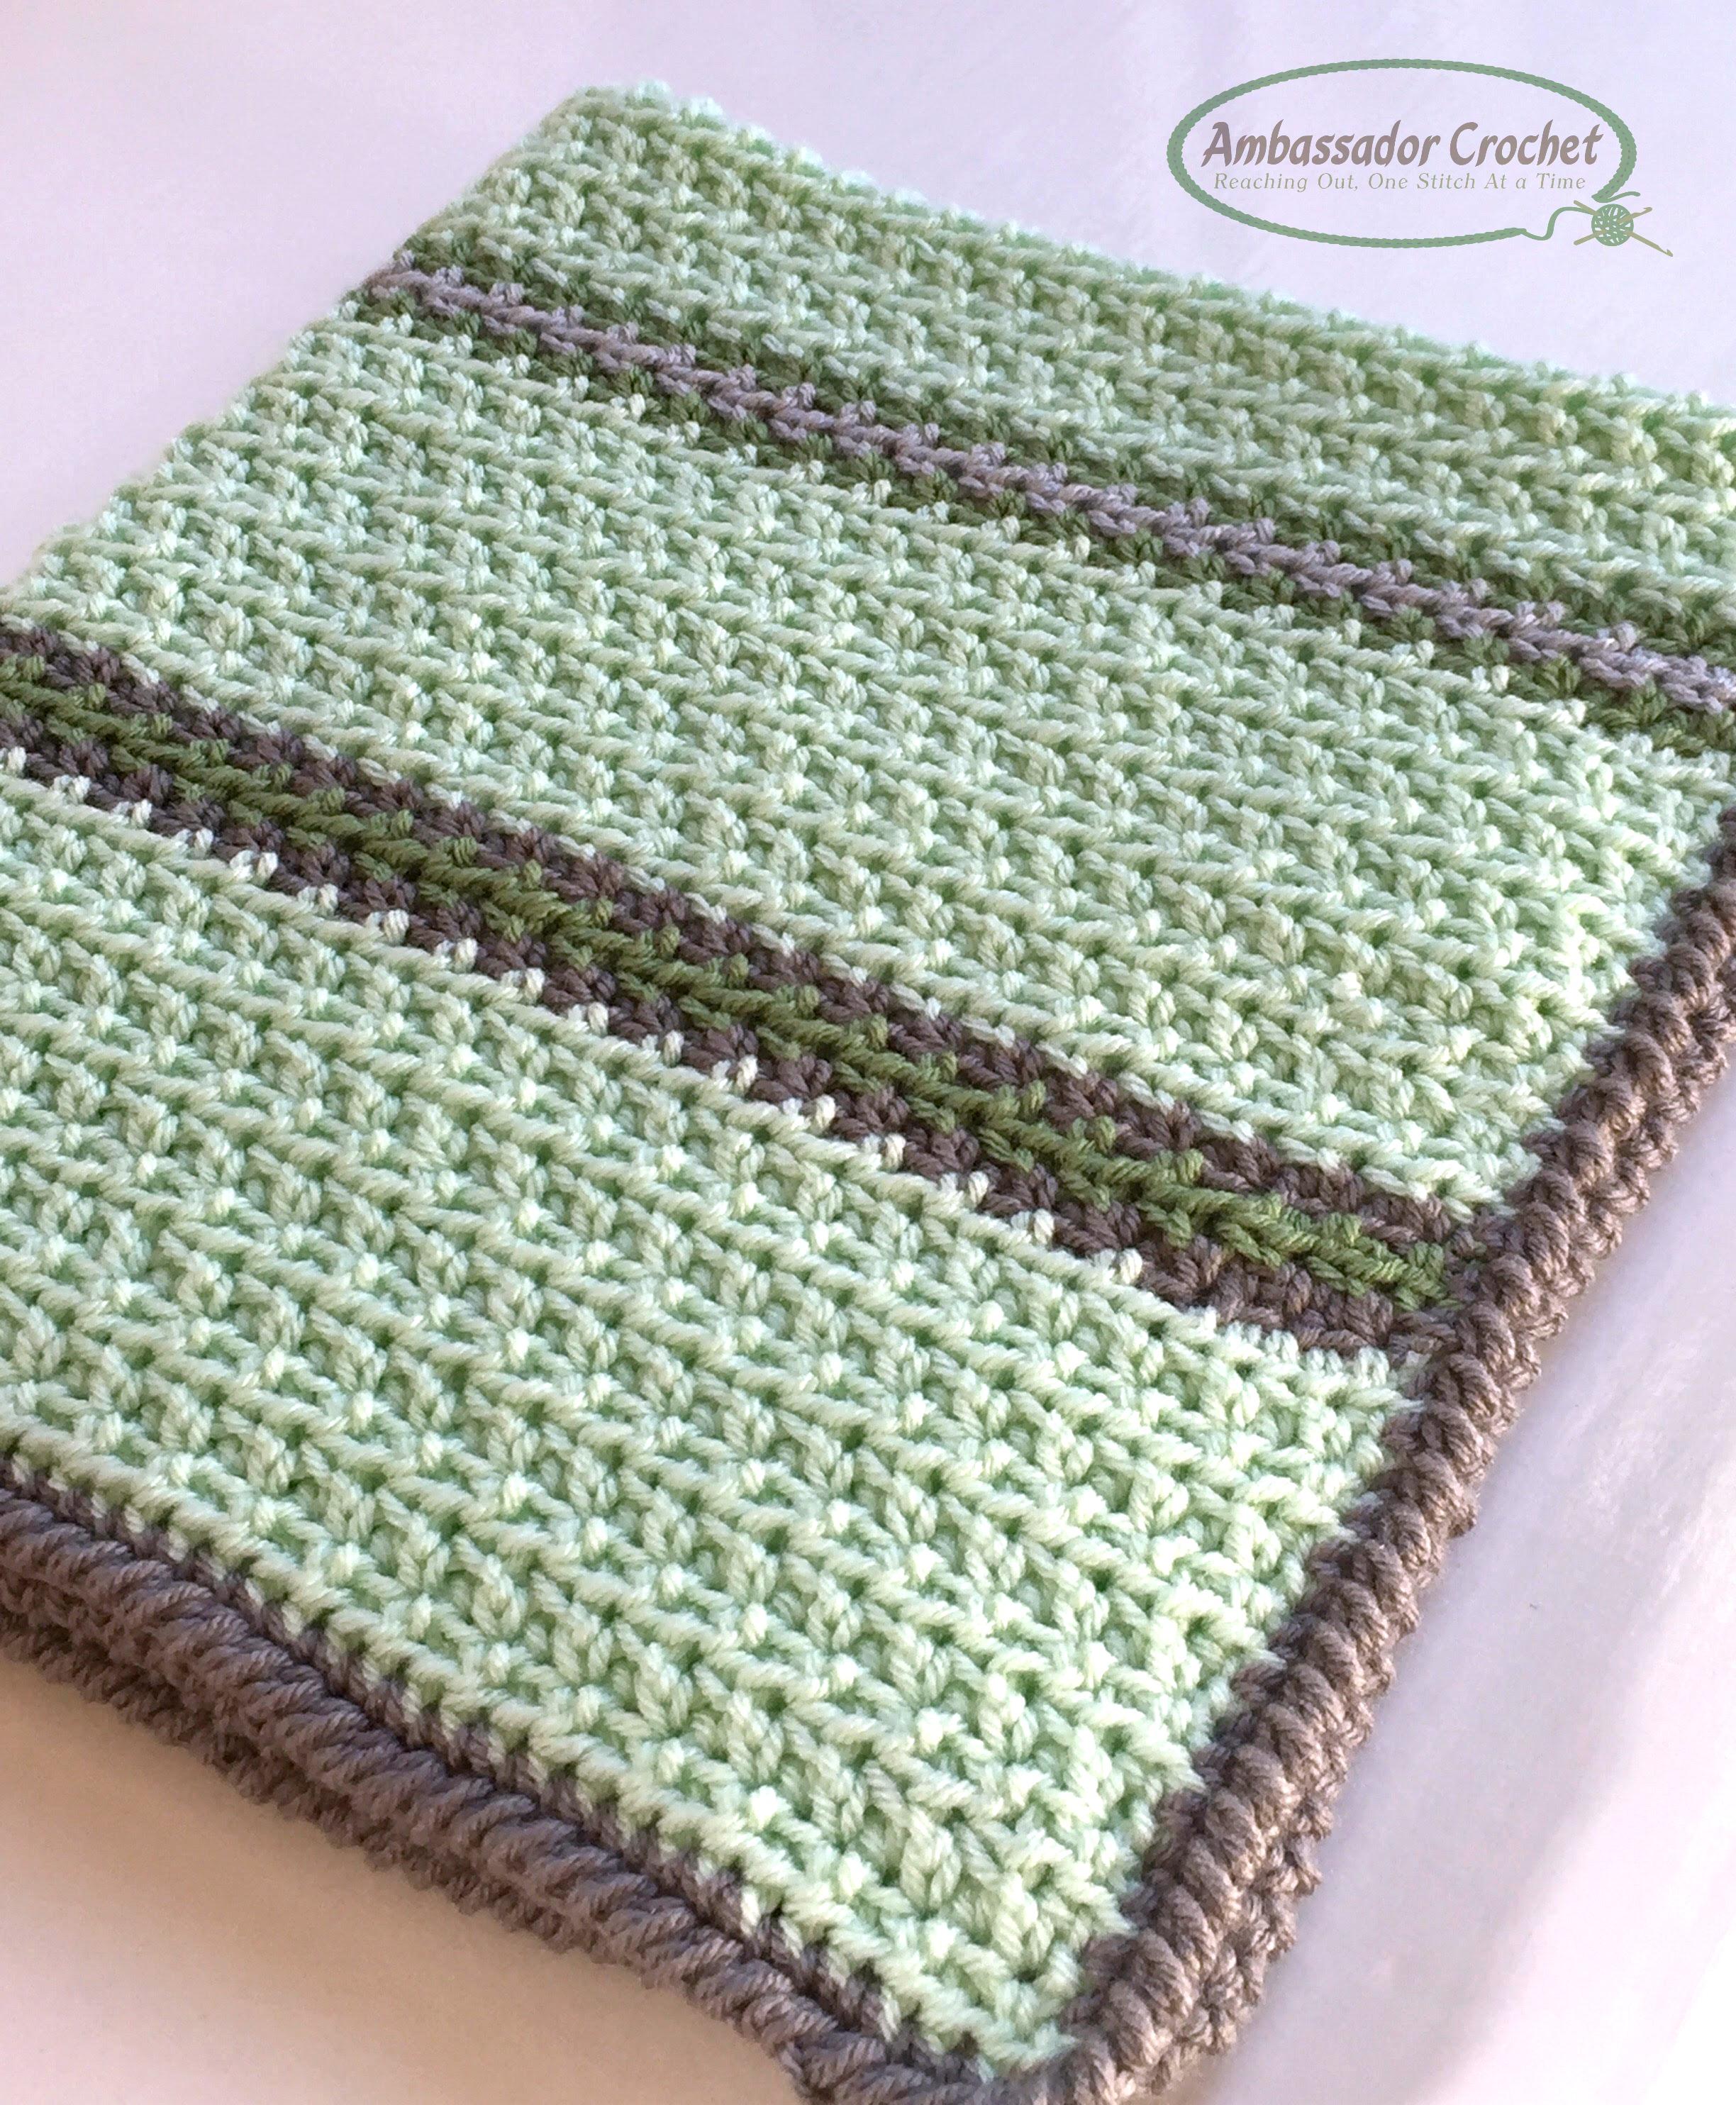 Soft Squishy Baby Blanket Crochet Pattern Ambassador Crochet